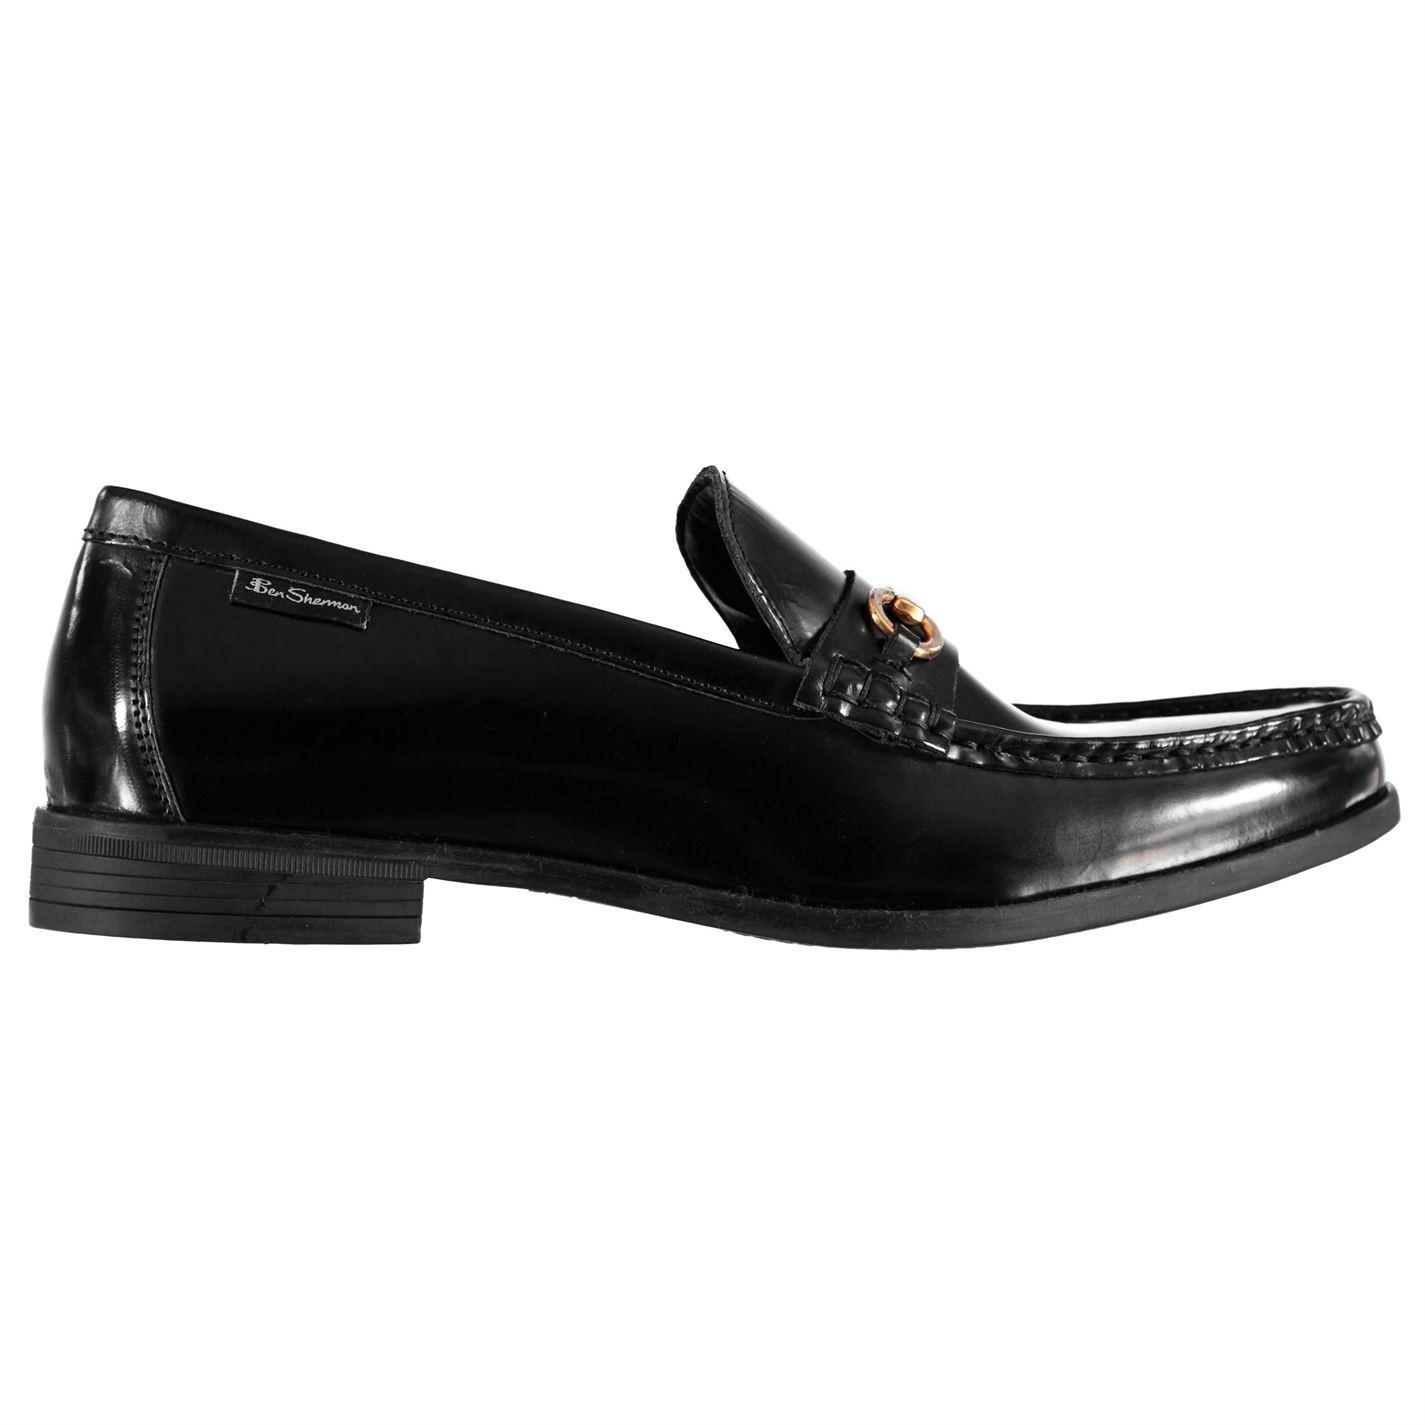 Ben-Sherman-Luca-Loafers-Slip-On-Shoes-Mens-Formal-Footwear-Flats thumbnail 6